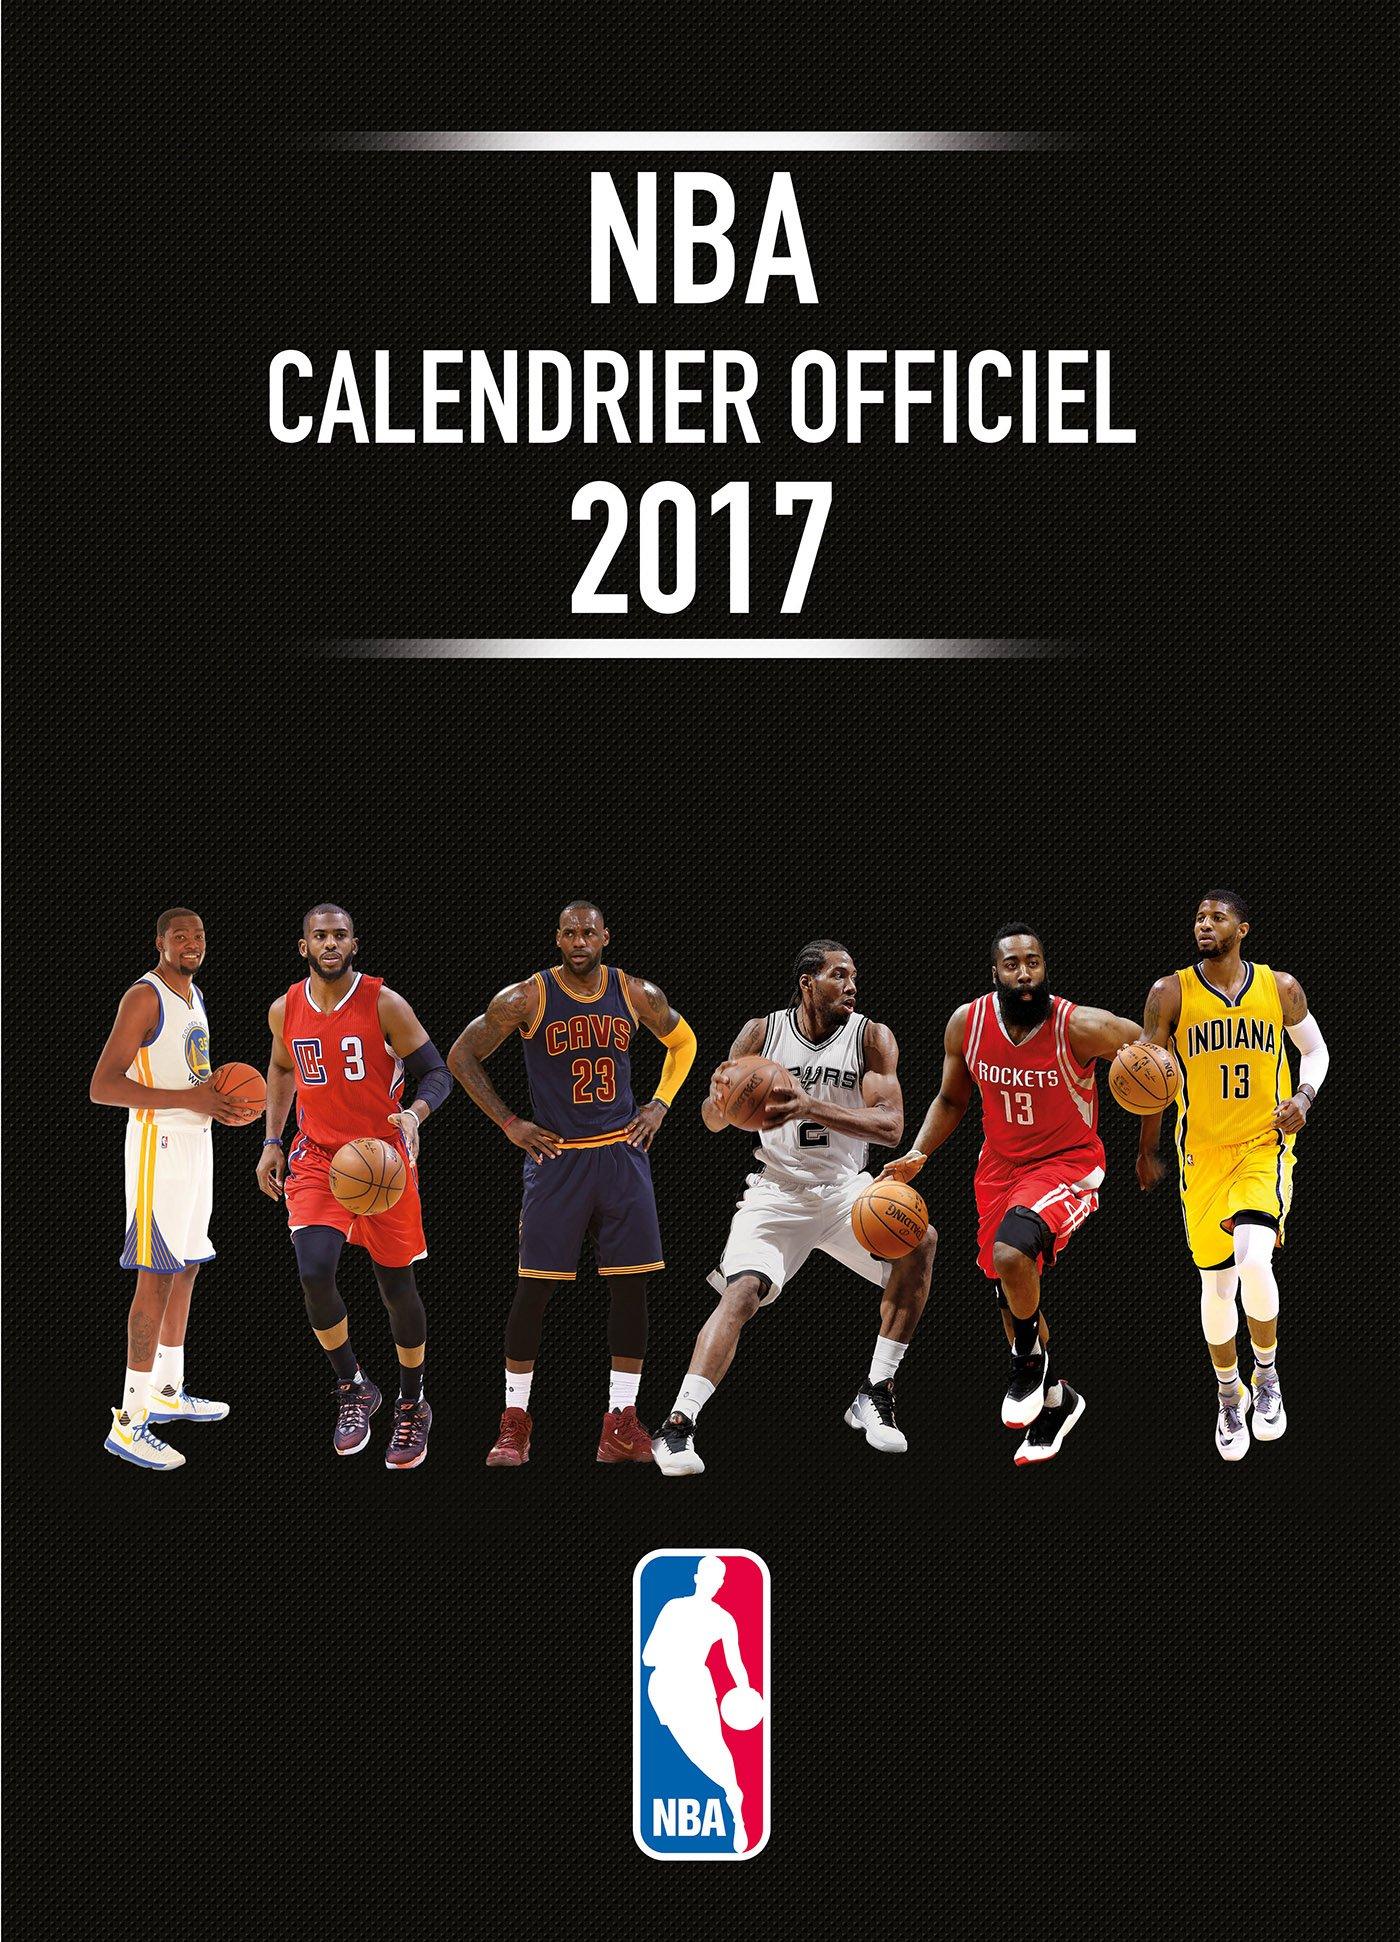 NBA - Calendrier officiel 2017 (TED.TALENT SPOR): Amazon.es: NBA ...